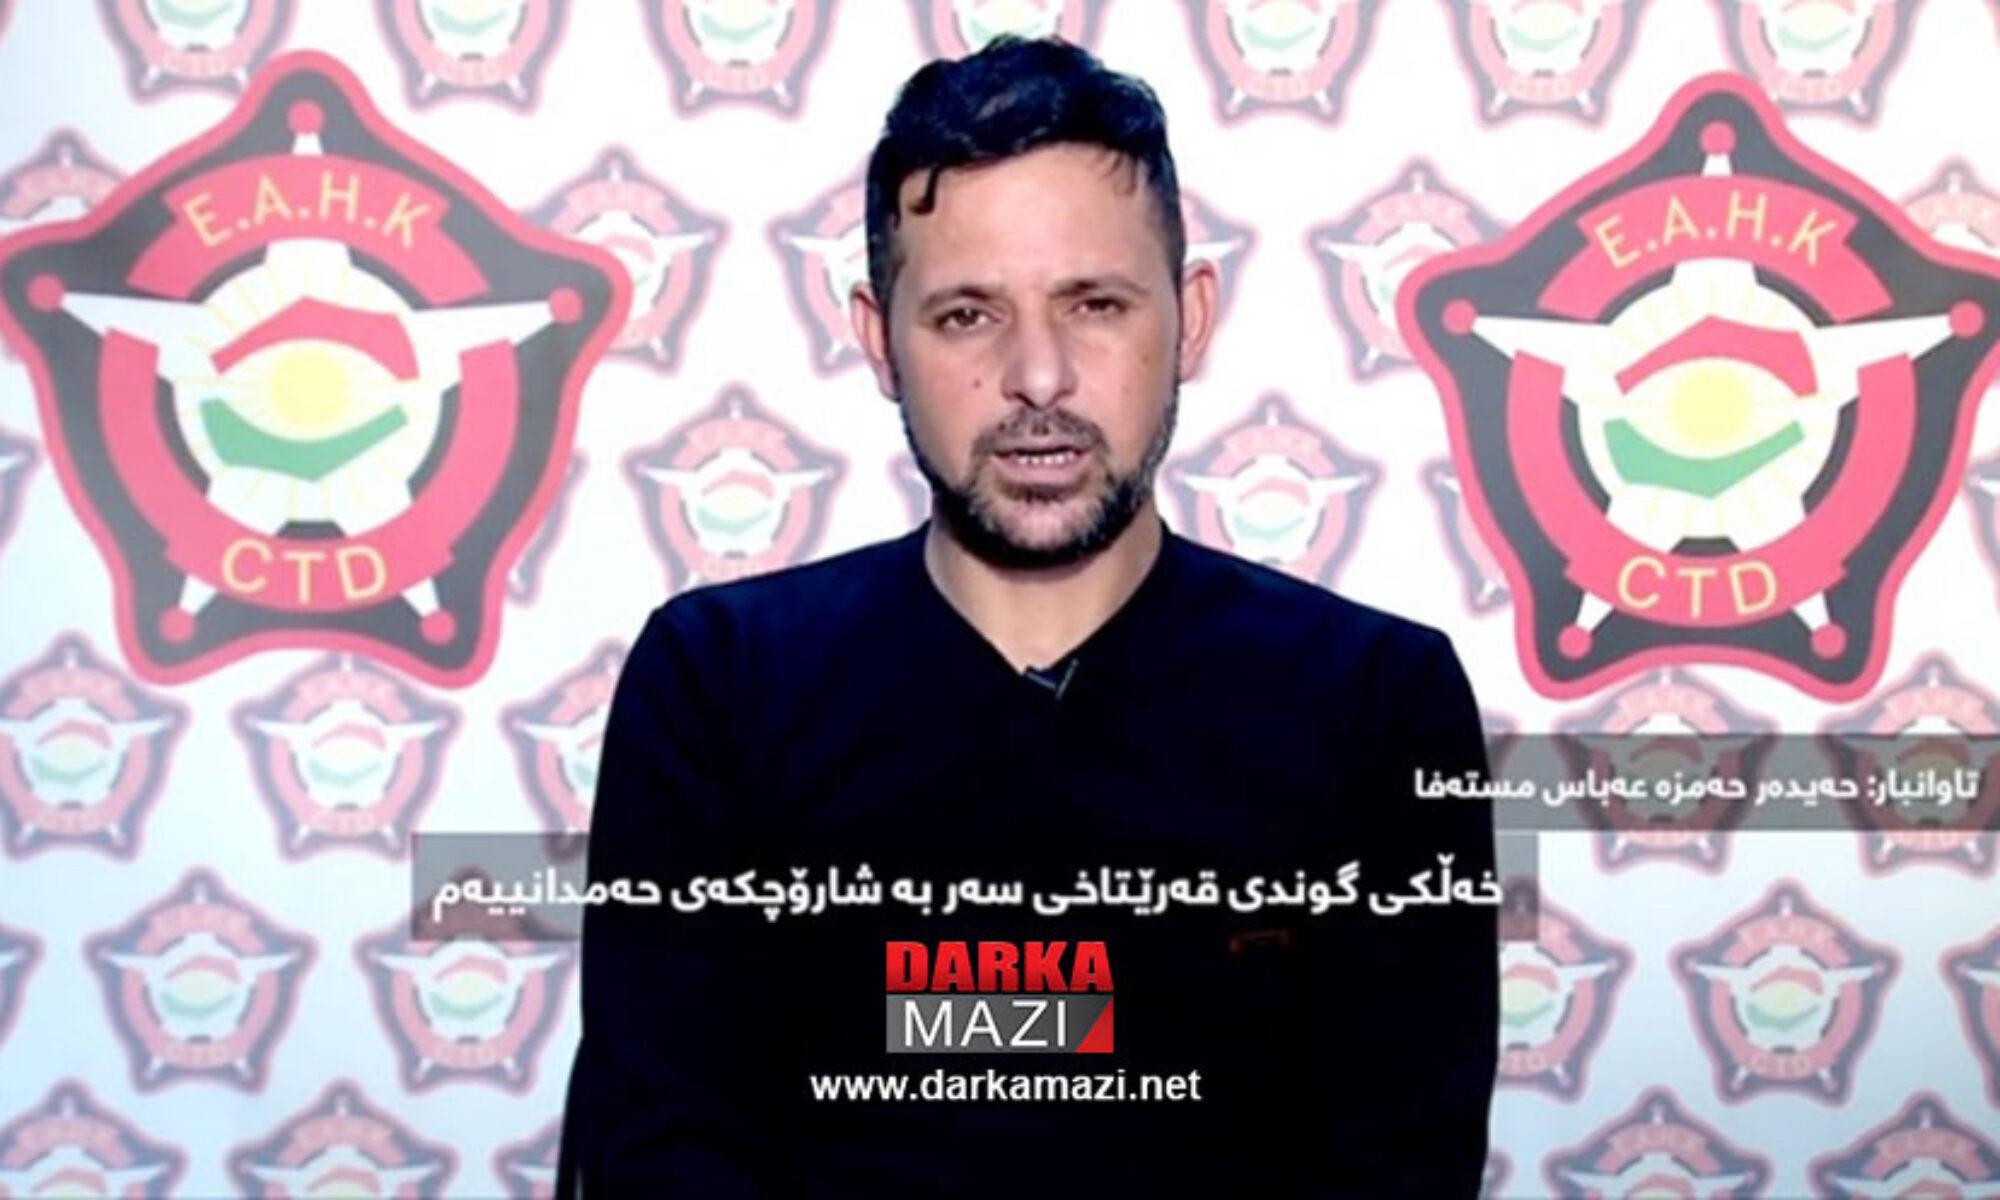 Erbil saldırısın yapanlardan birinin itirafları Ketaib Seyyidü'ş Şüheda Haşdi Şabi